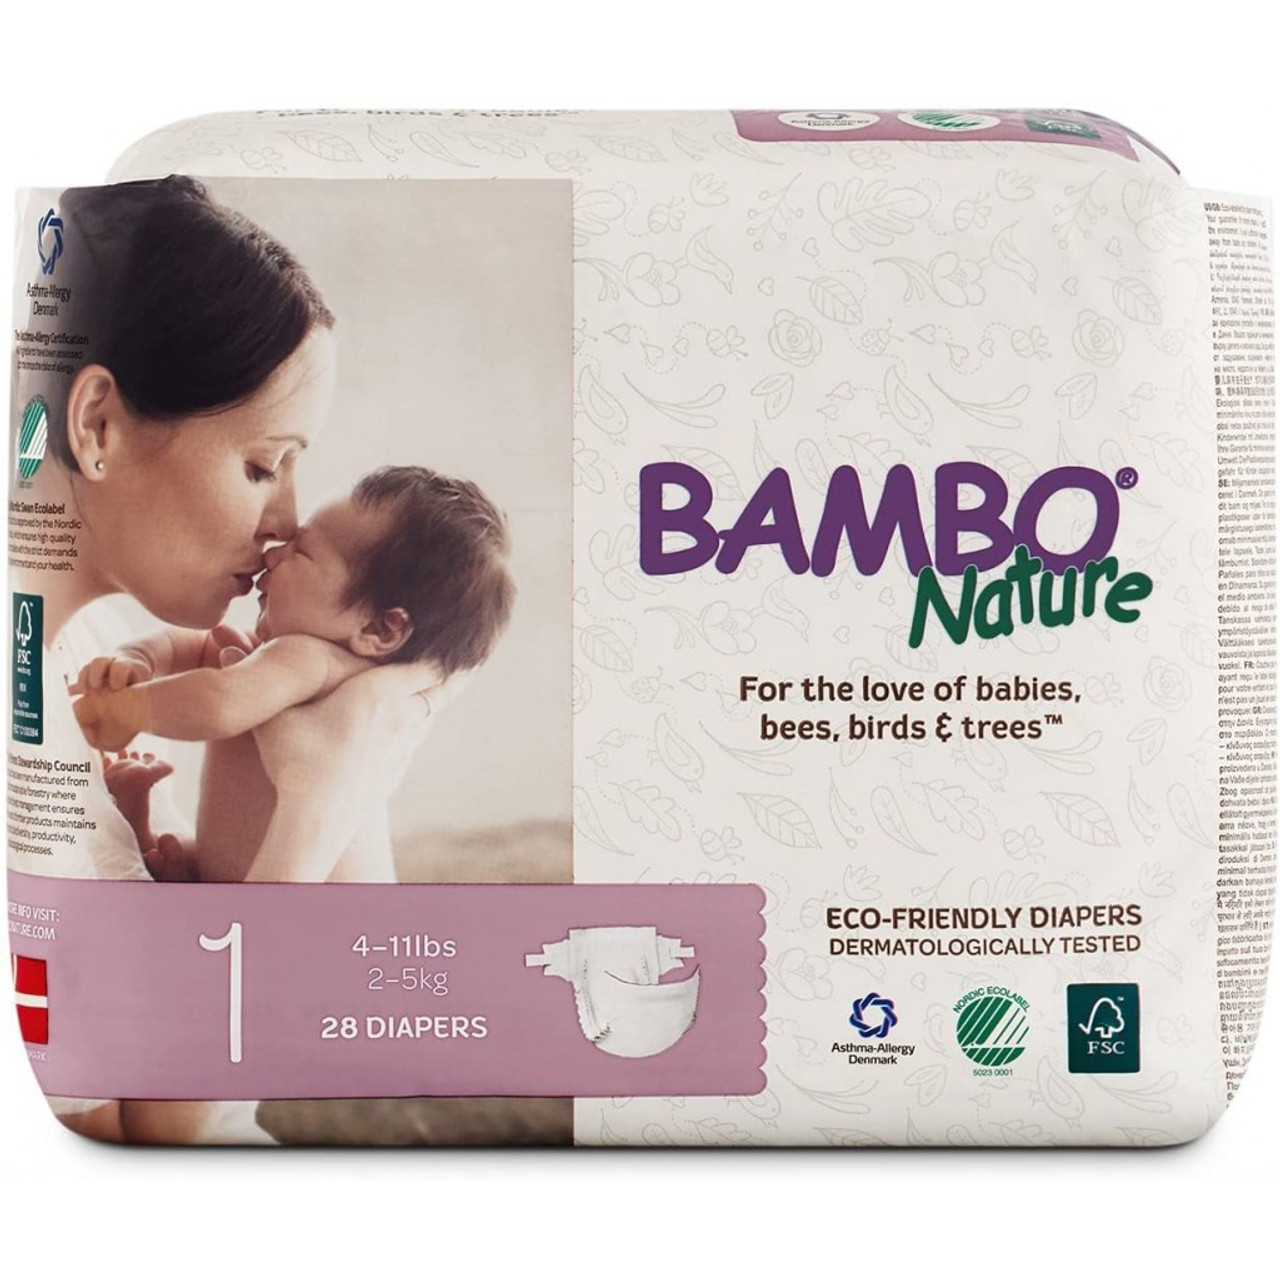 BAMBO NATURE DREAM DIAPERS #1